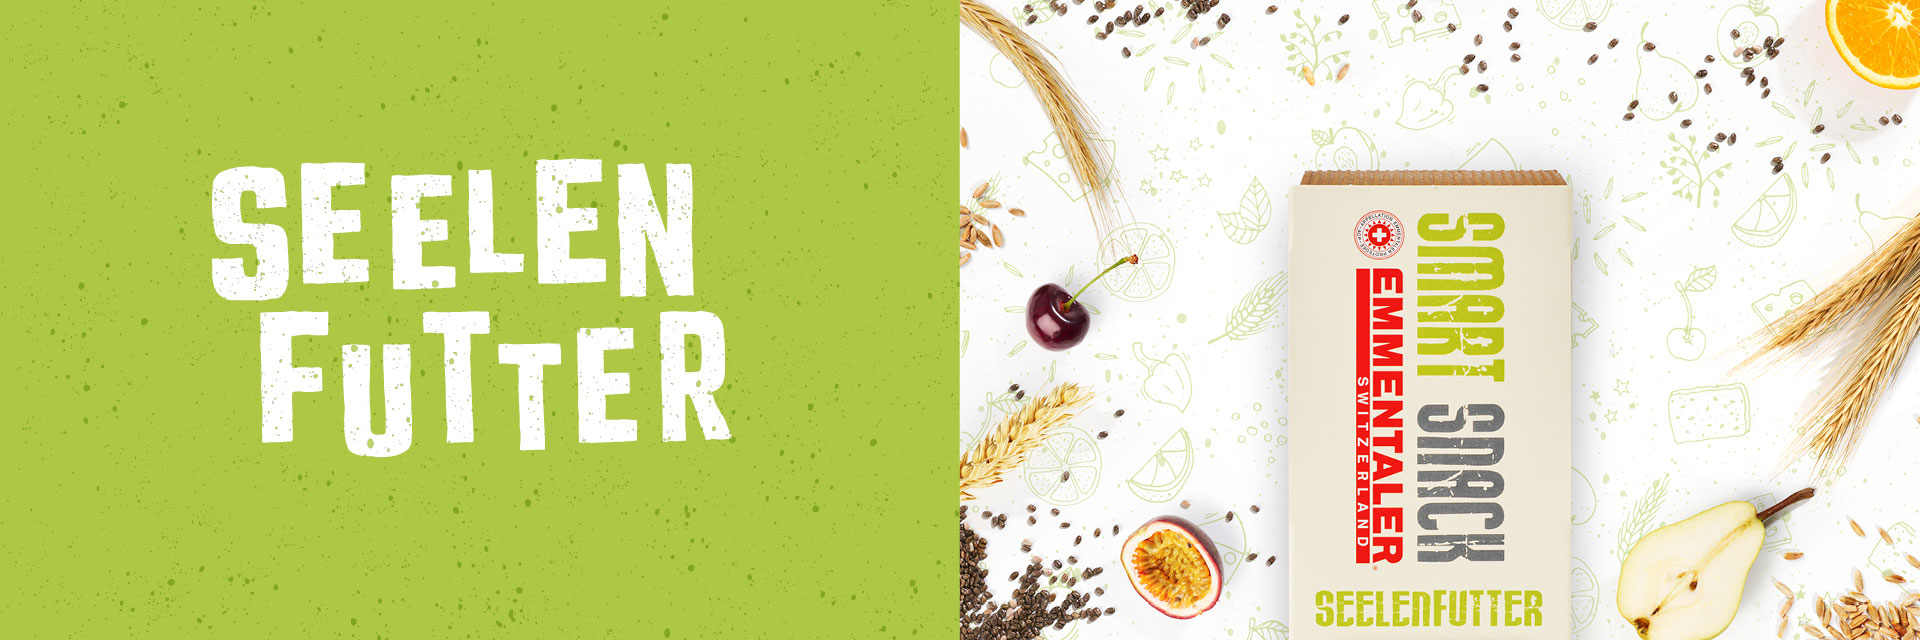 Emmentaler Smart Snack Seelenfutter Closeup Typo